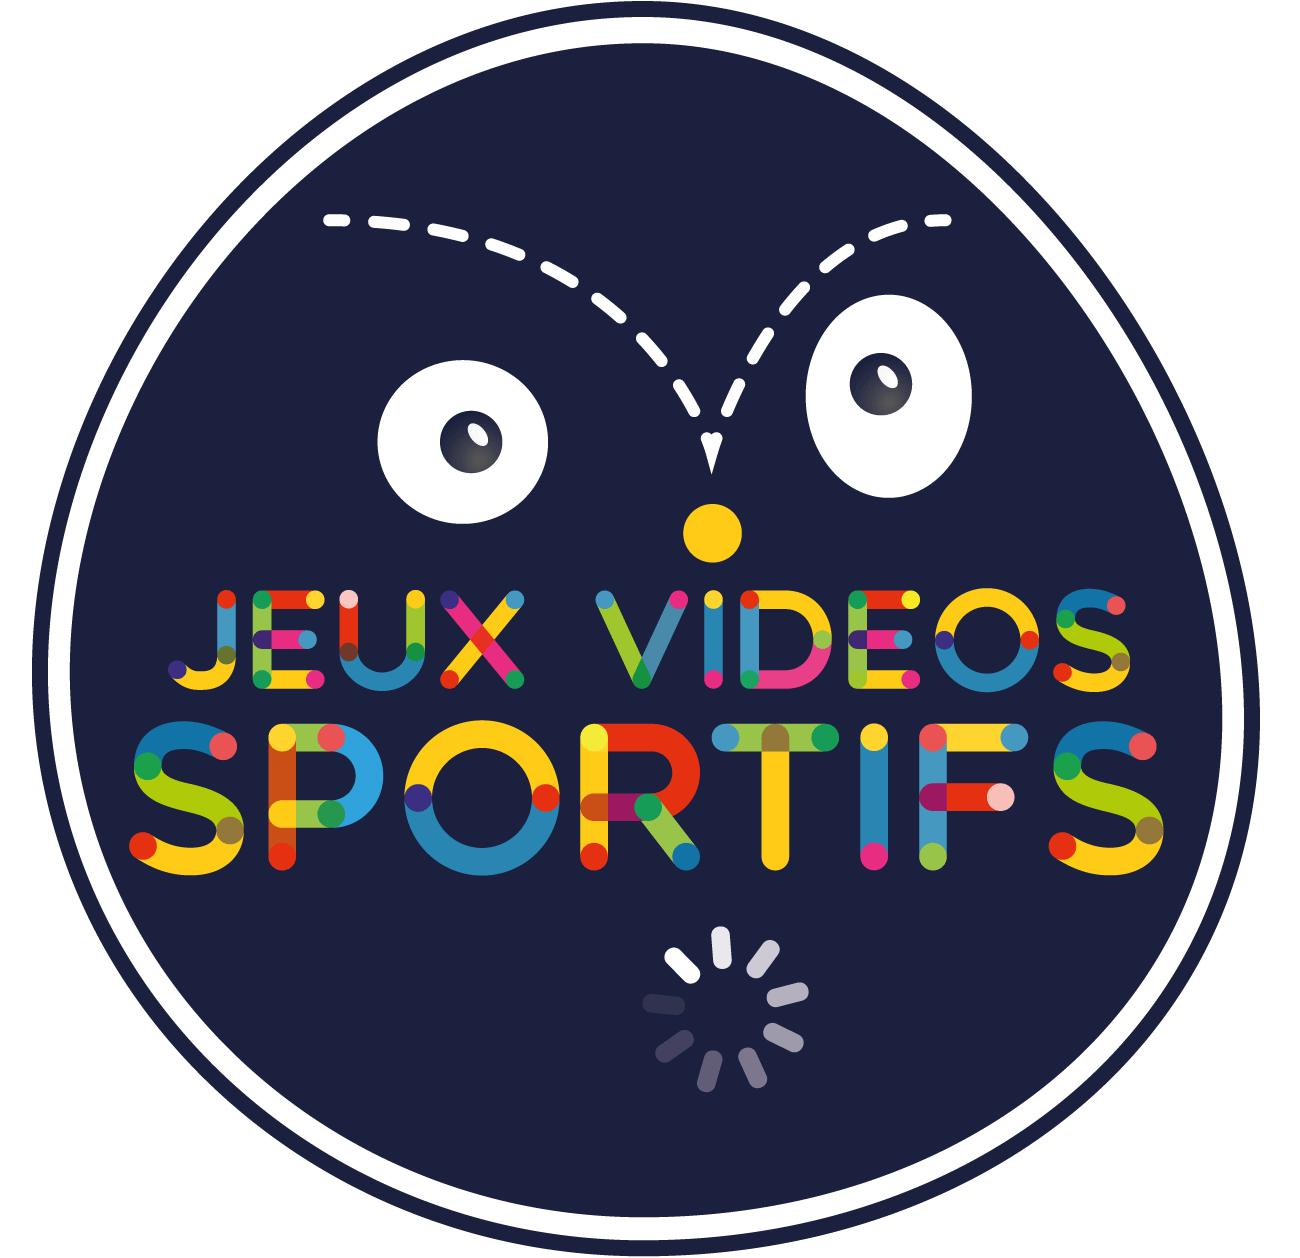 jeux video sportifs